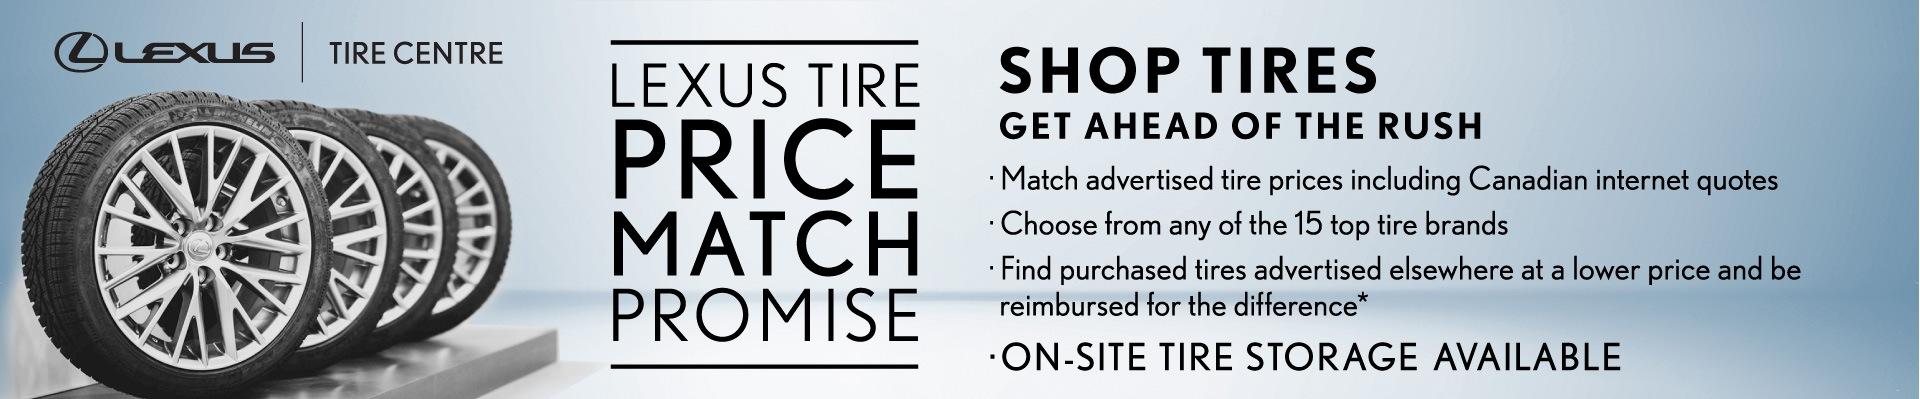 Lexus tires tire price match promise in toronto ontario gta rims winter tires costco michelin bridgestone